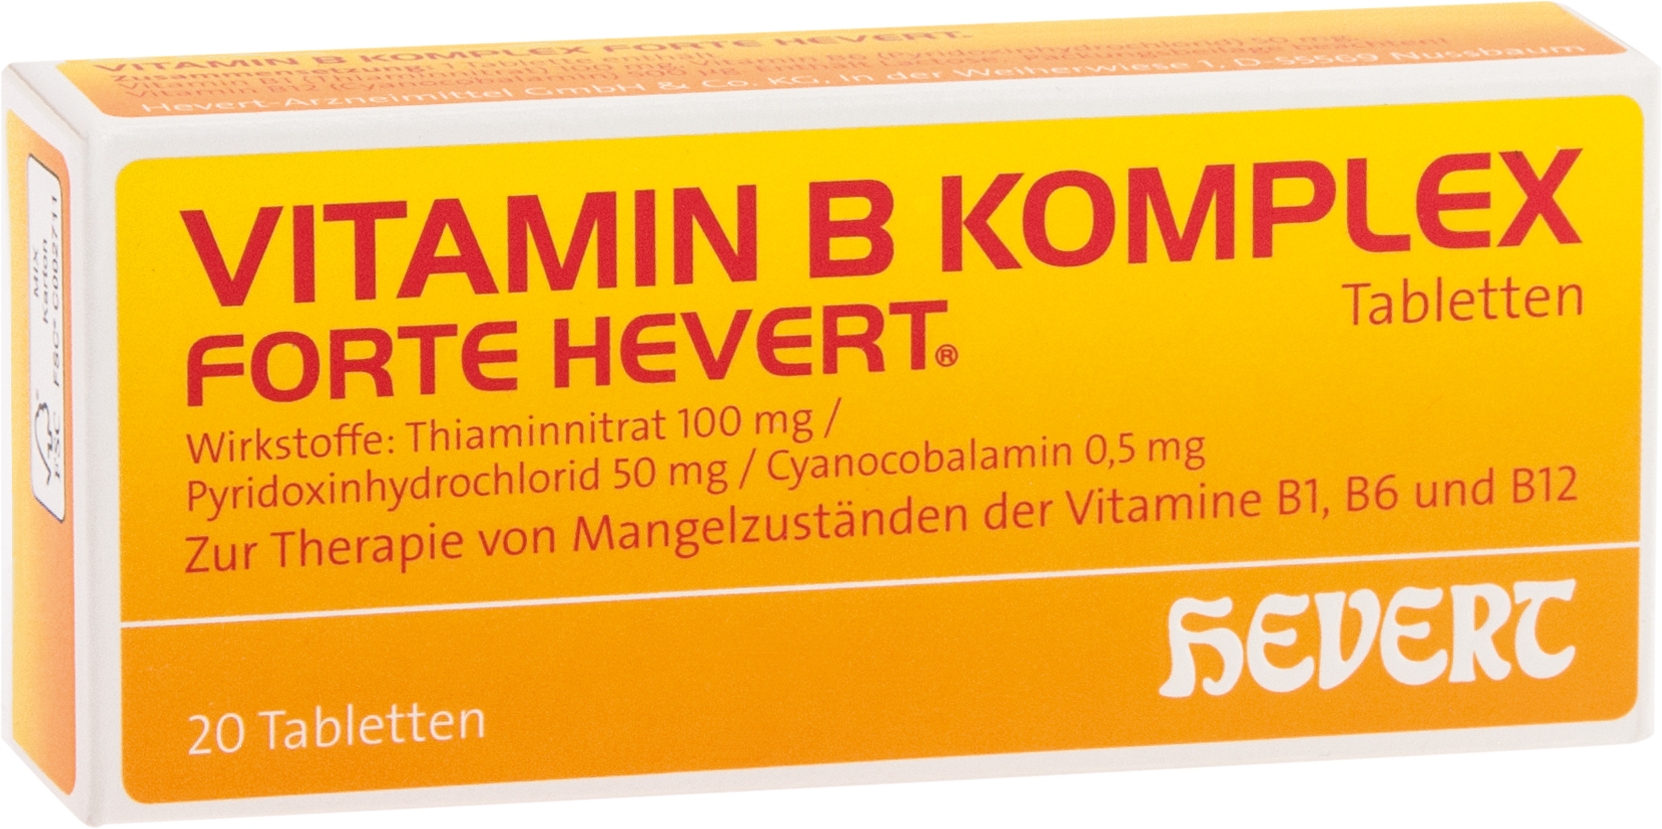 Vitamin B-Komplex forte Hevert